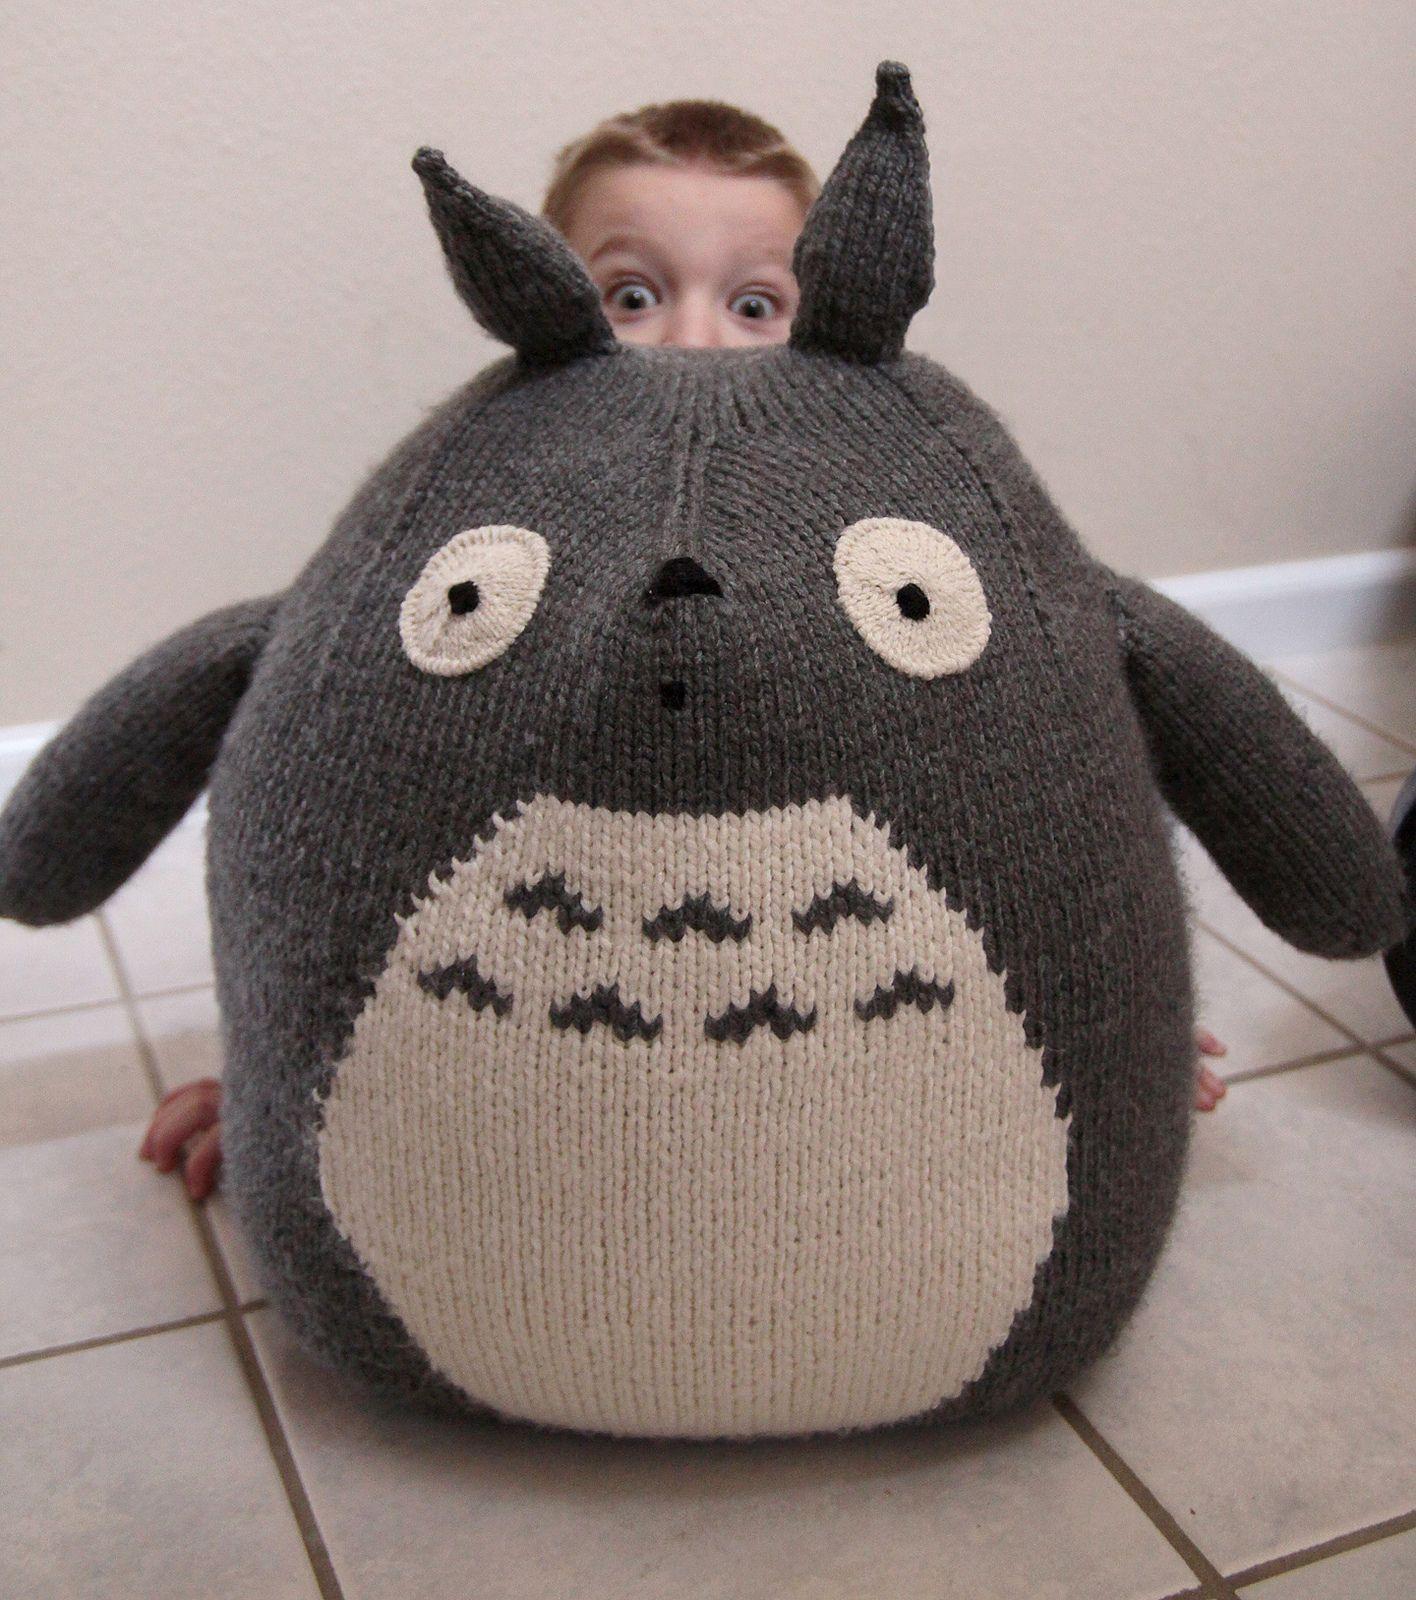 Fantastical Creature Knitting Patterns | Hayao miyazaki, Miyazaki ...